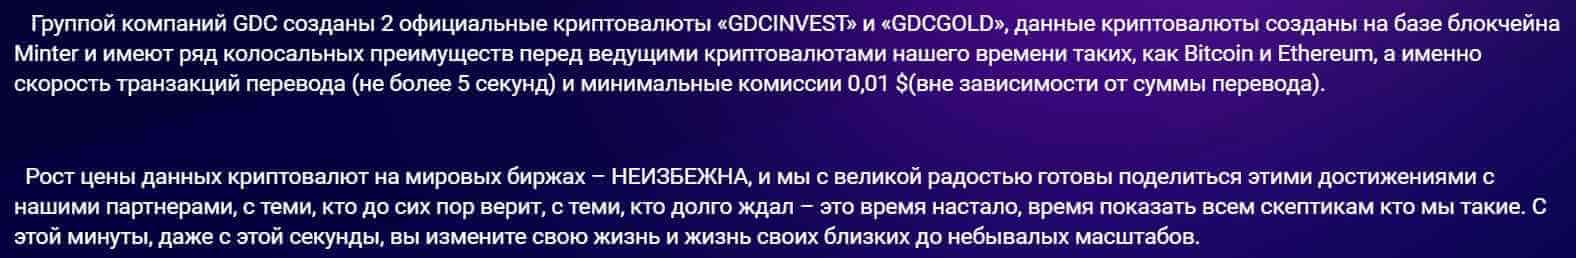 Валюты GBC